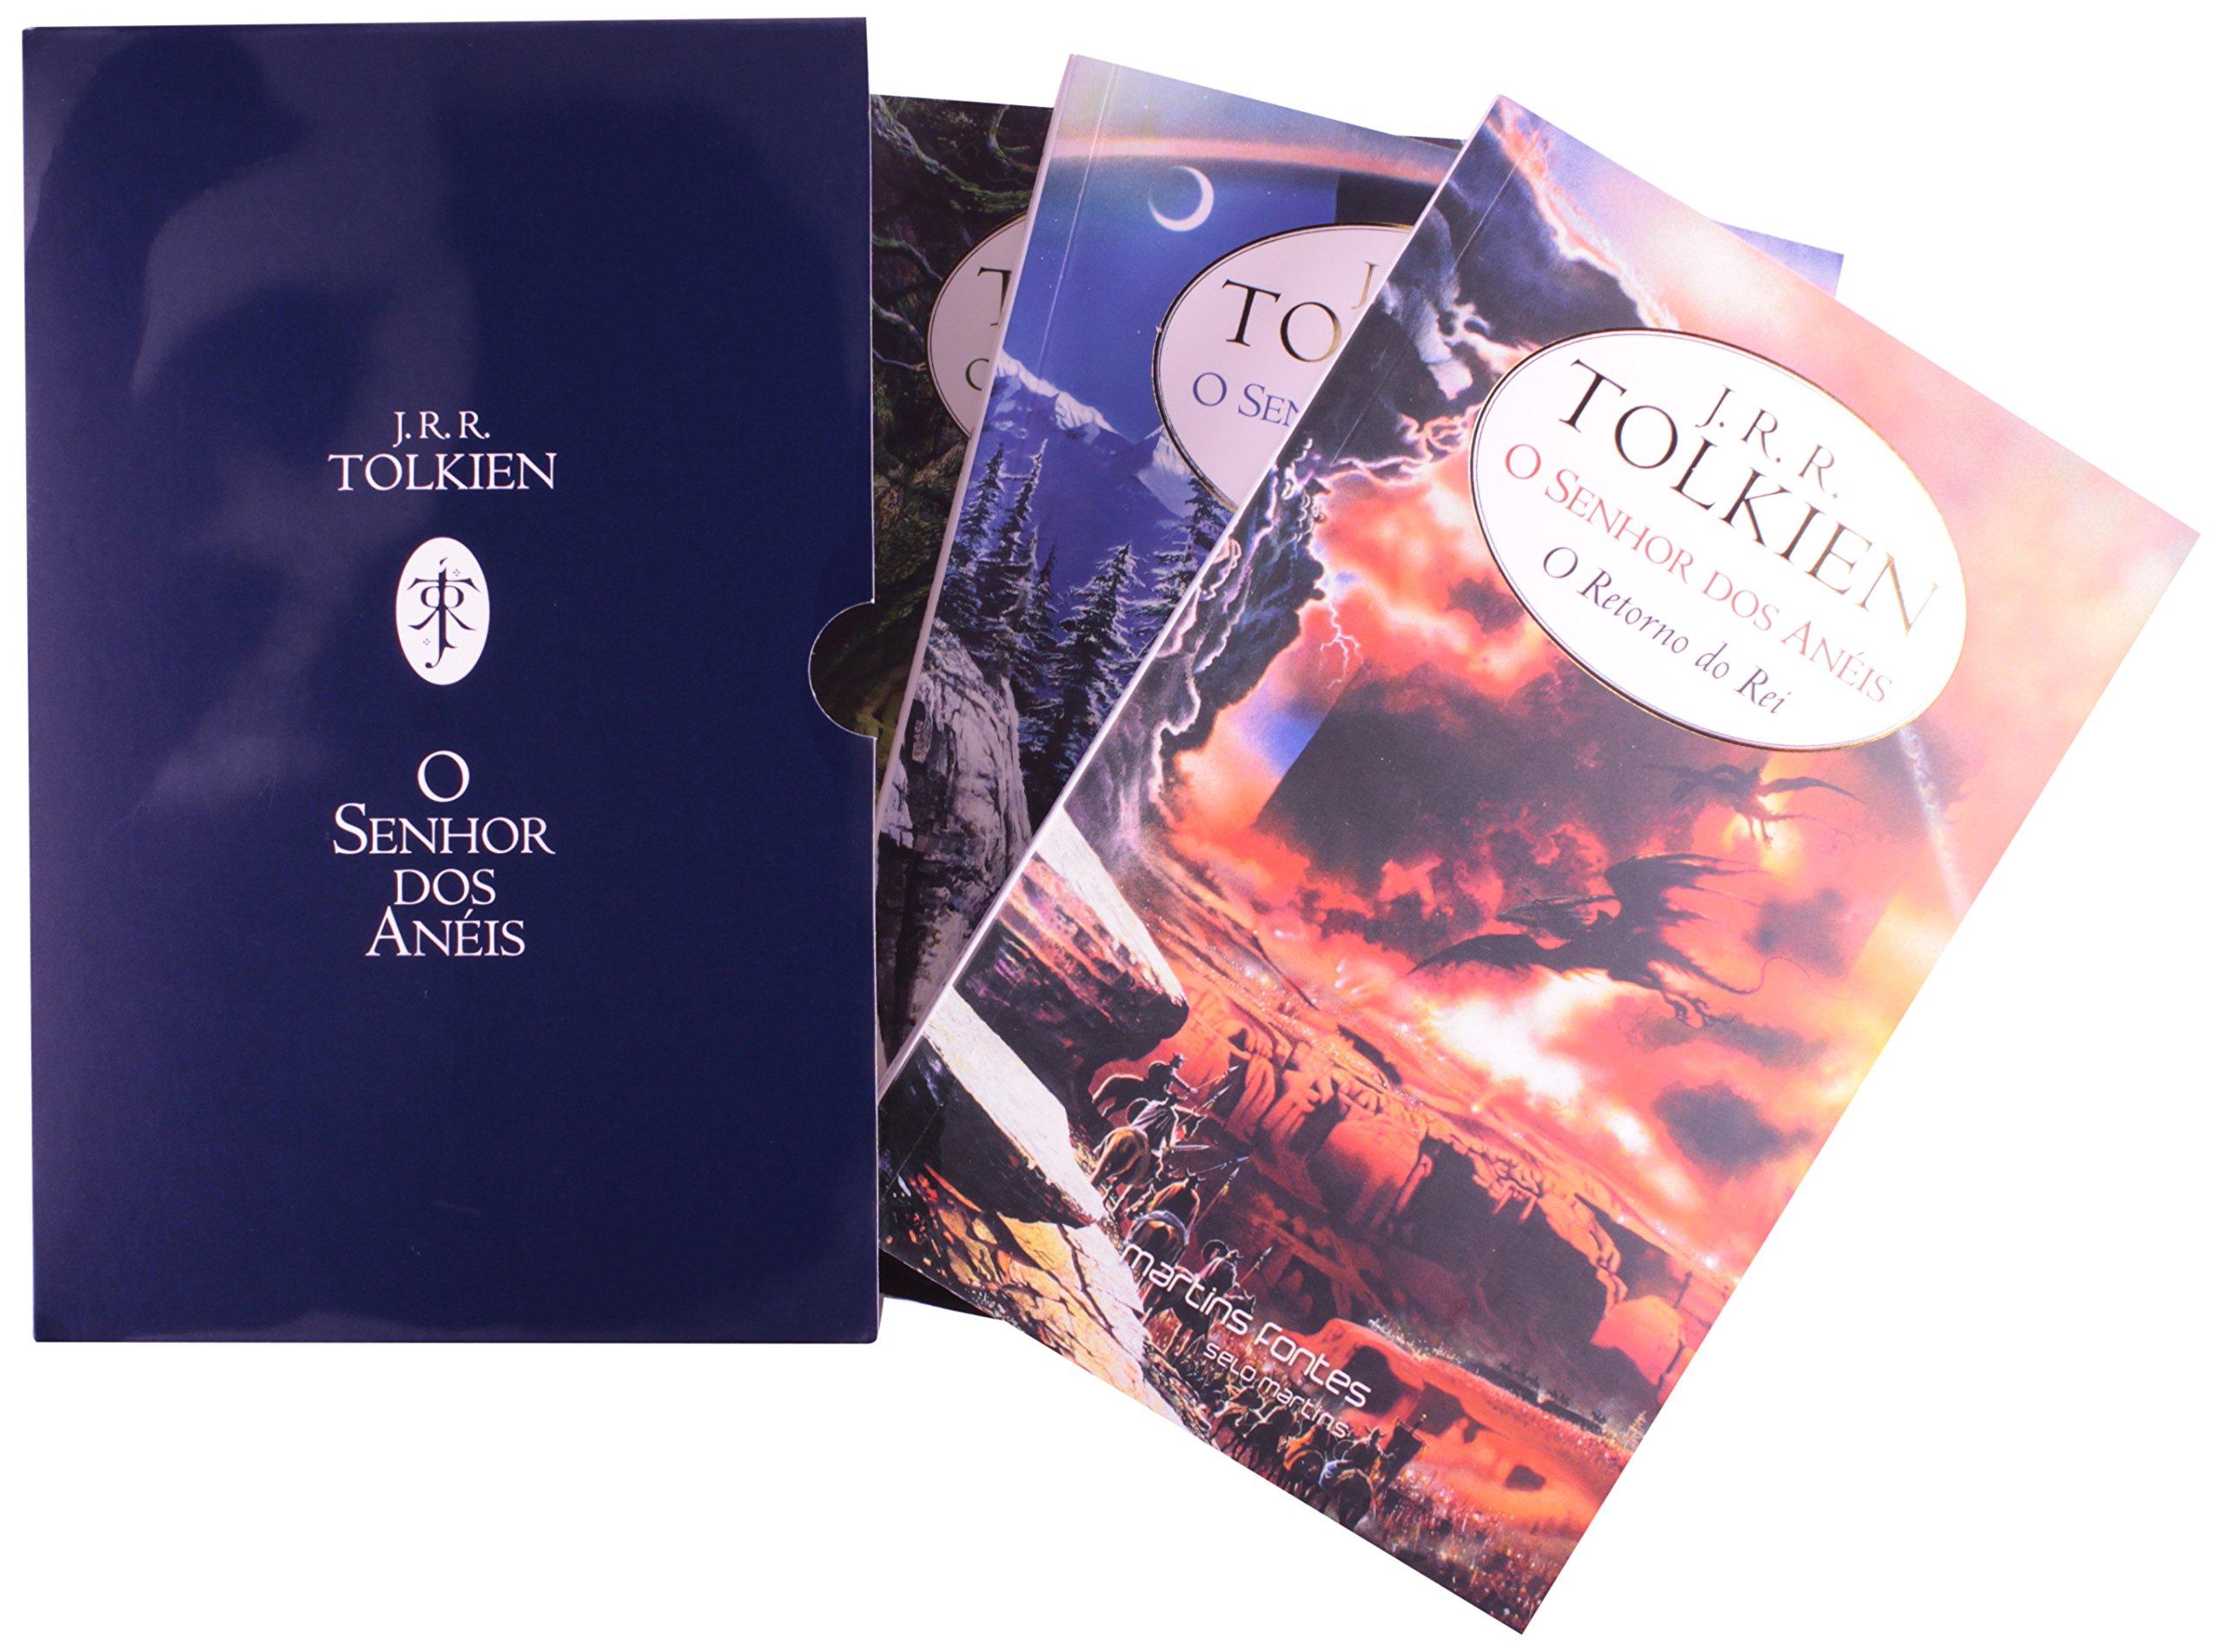 Senhor dos anis o j r r tolkien 9788533615670 amazon books fandeluxe Choice Image